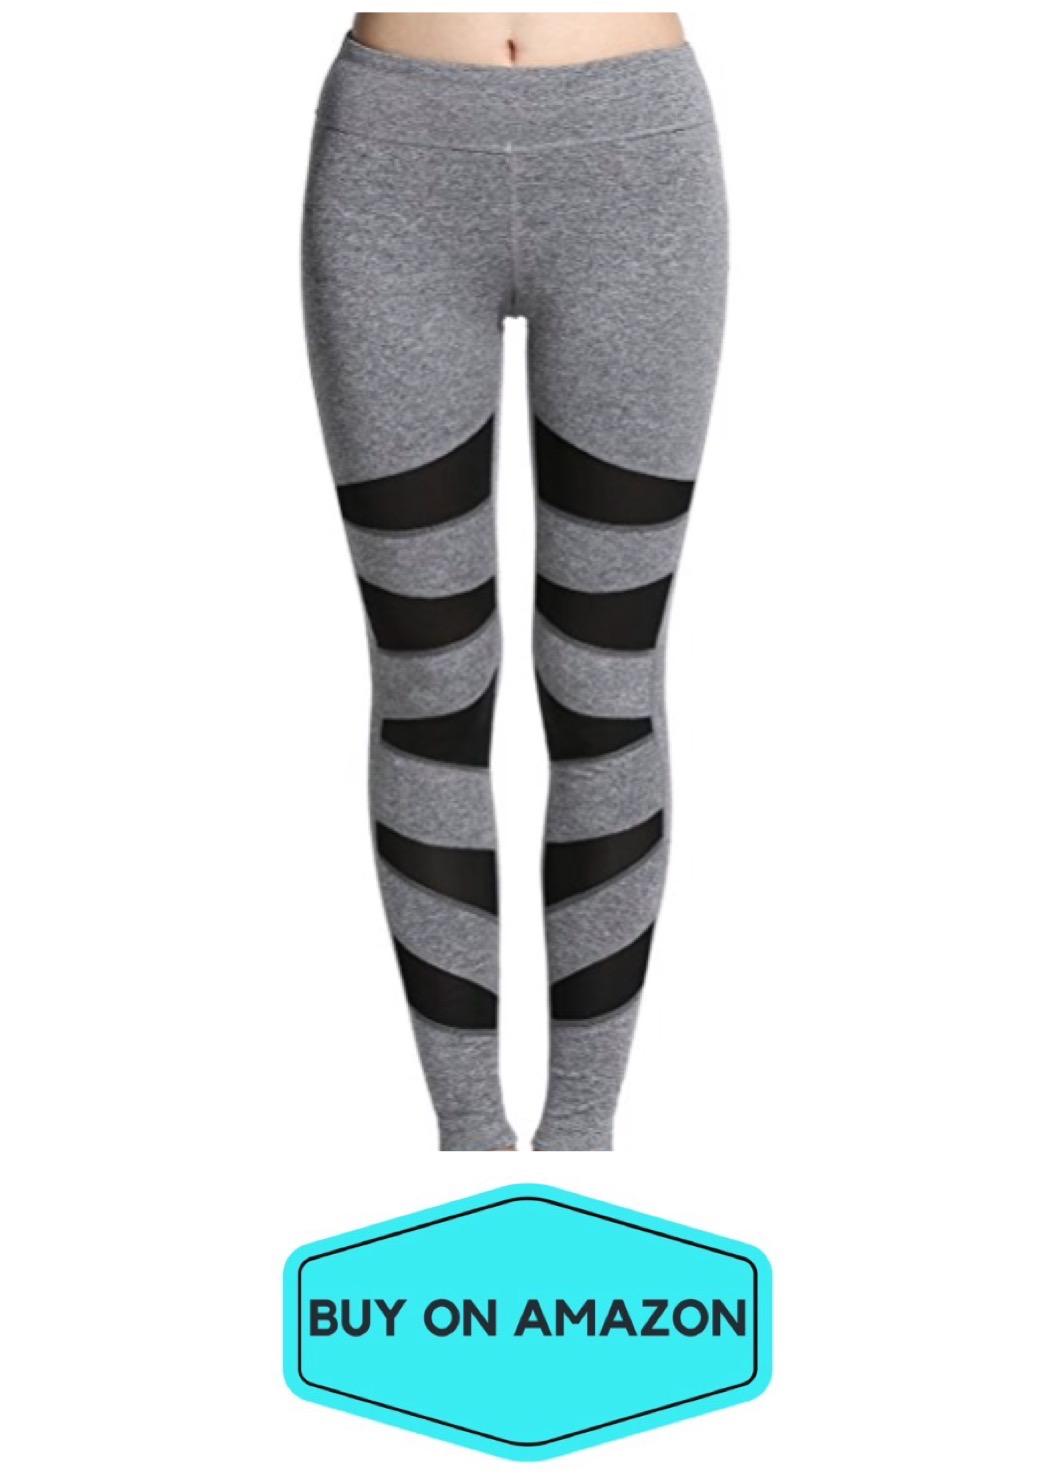 Gray/Black Mesh Leggings